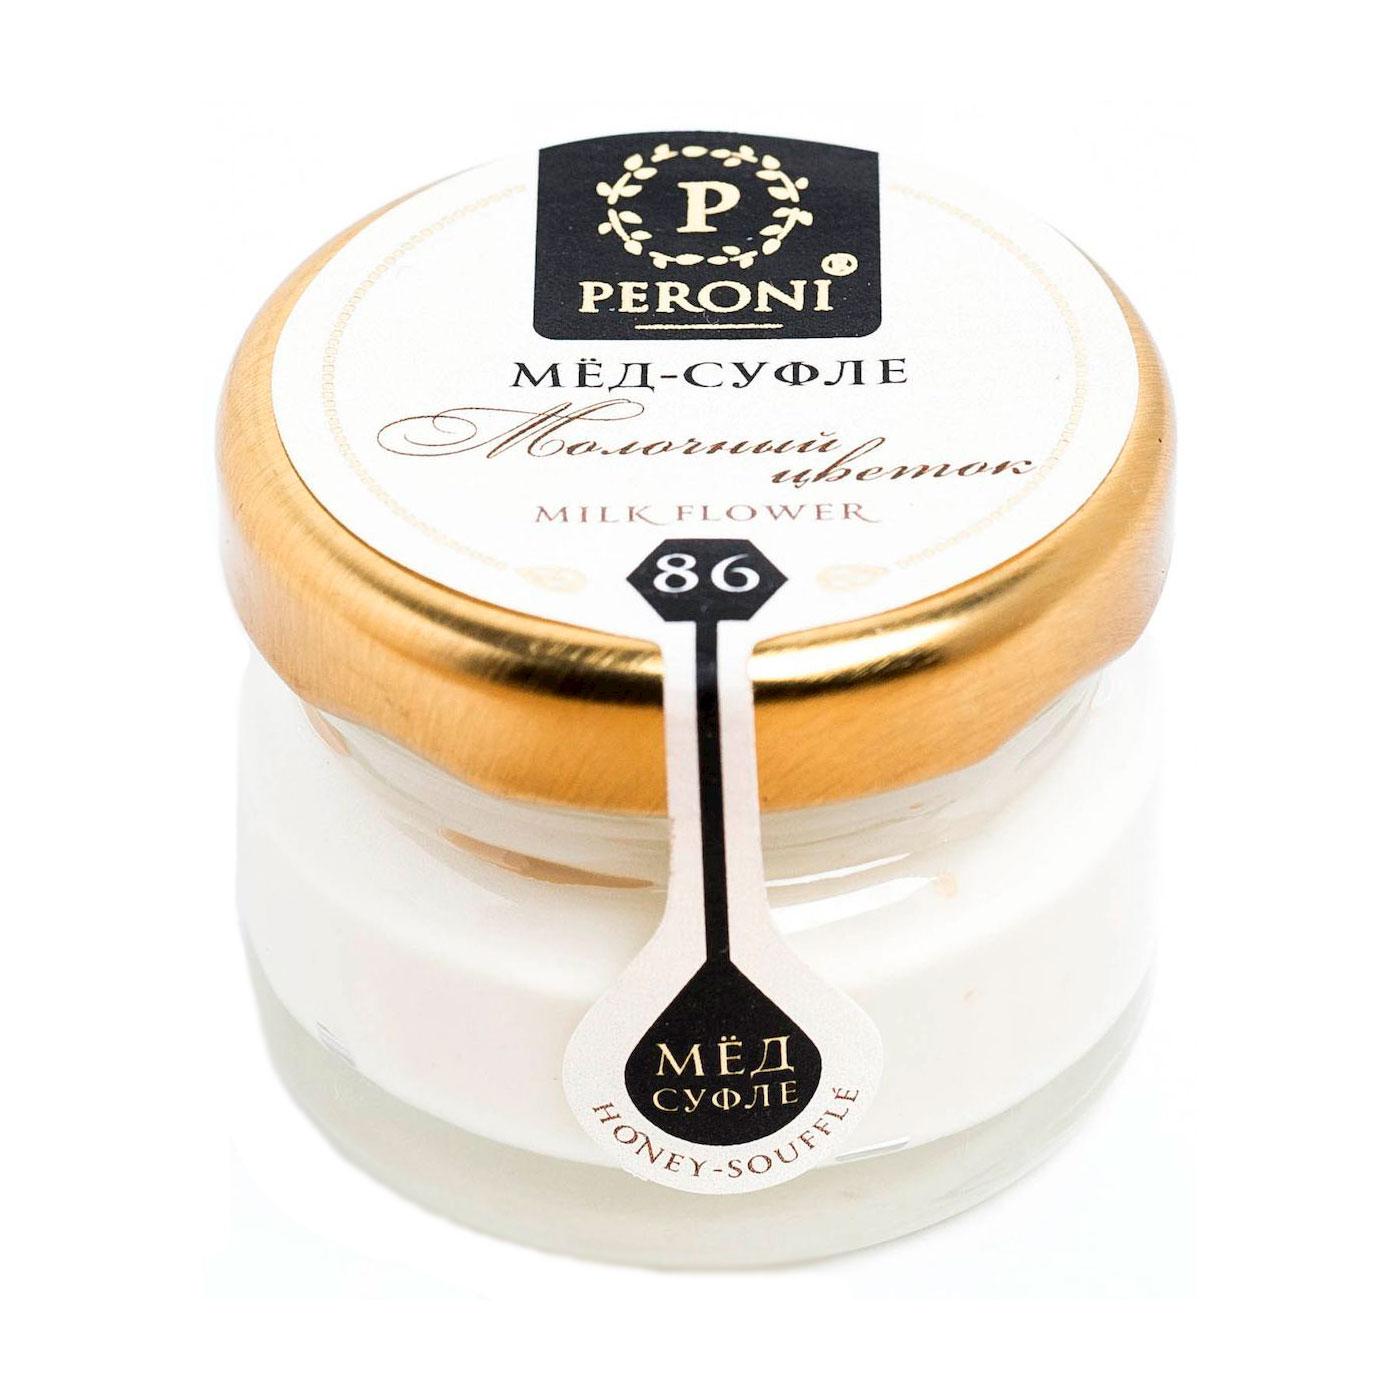 Мёд-суфле Peroni Honey 30 мл Молочный цветок (маленькая)<br>